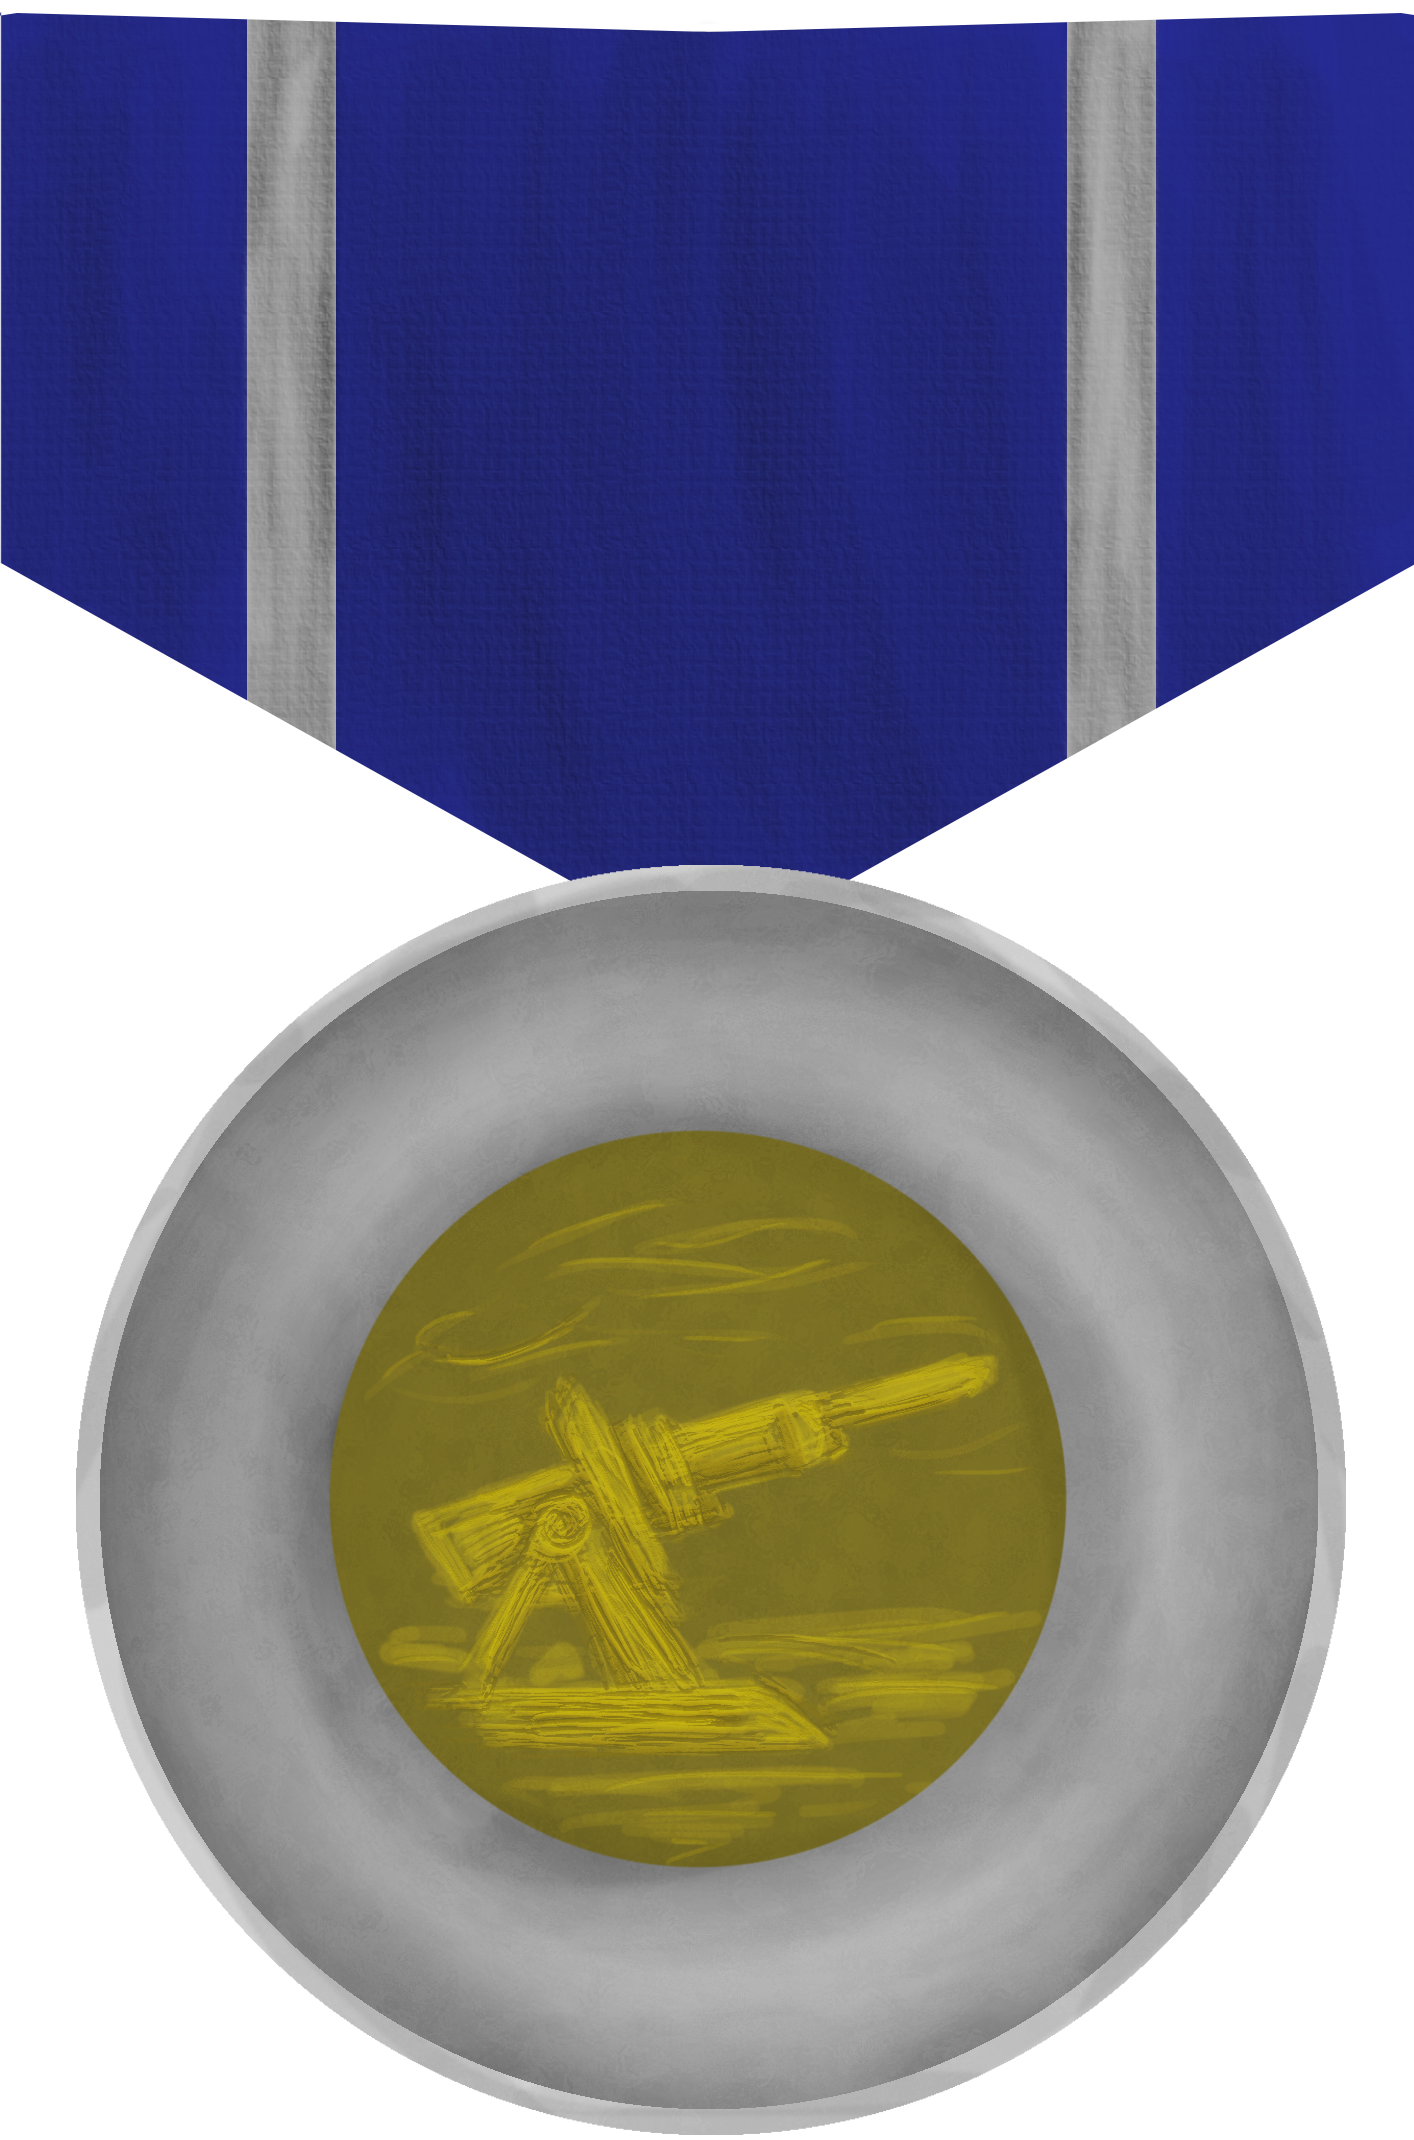 Cannonade_Breachman_Medal.png